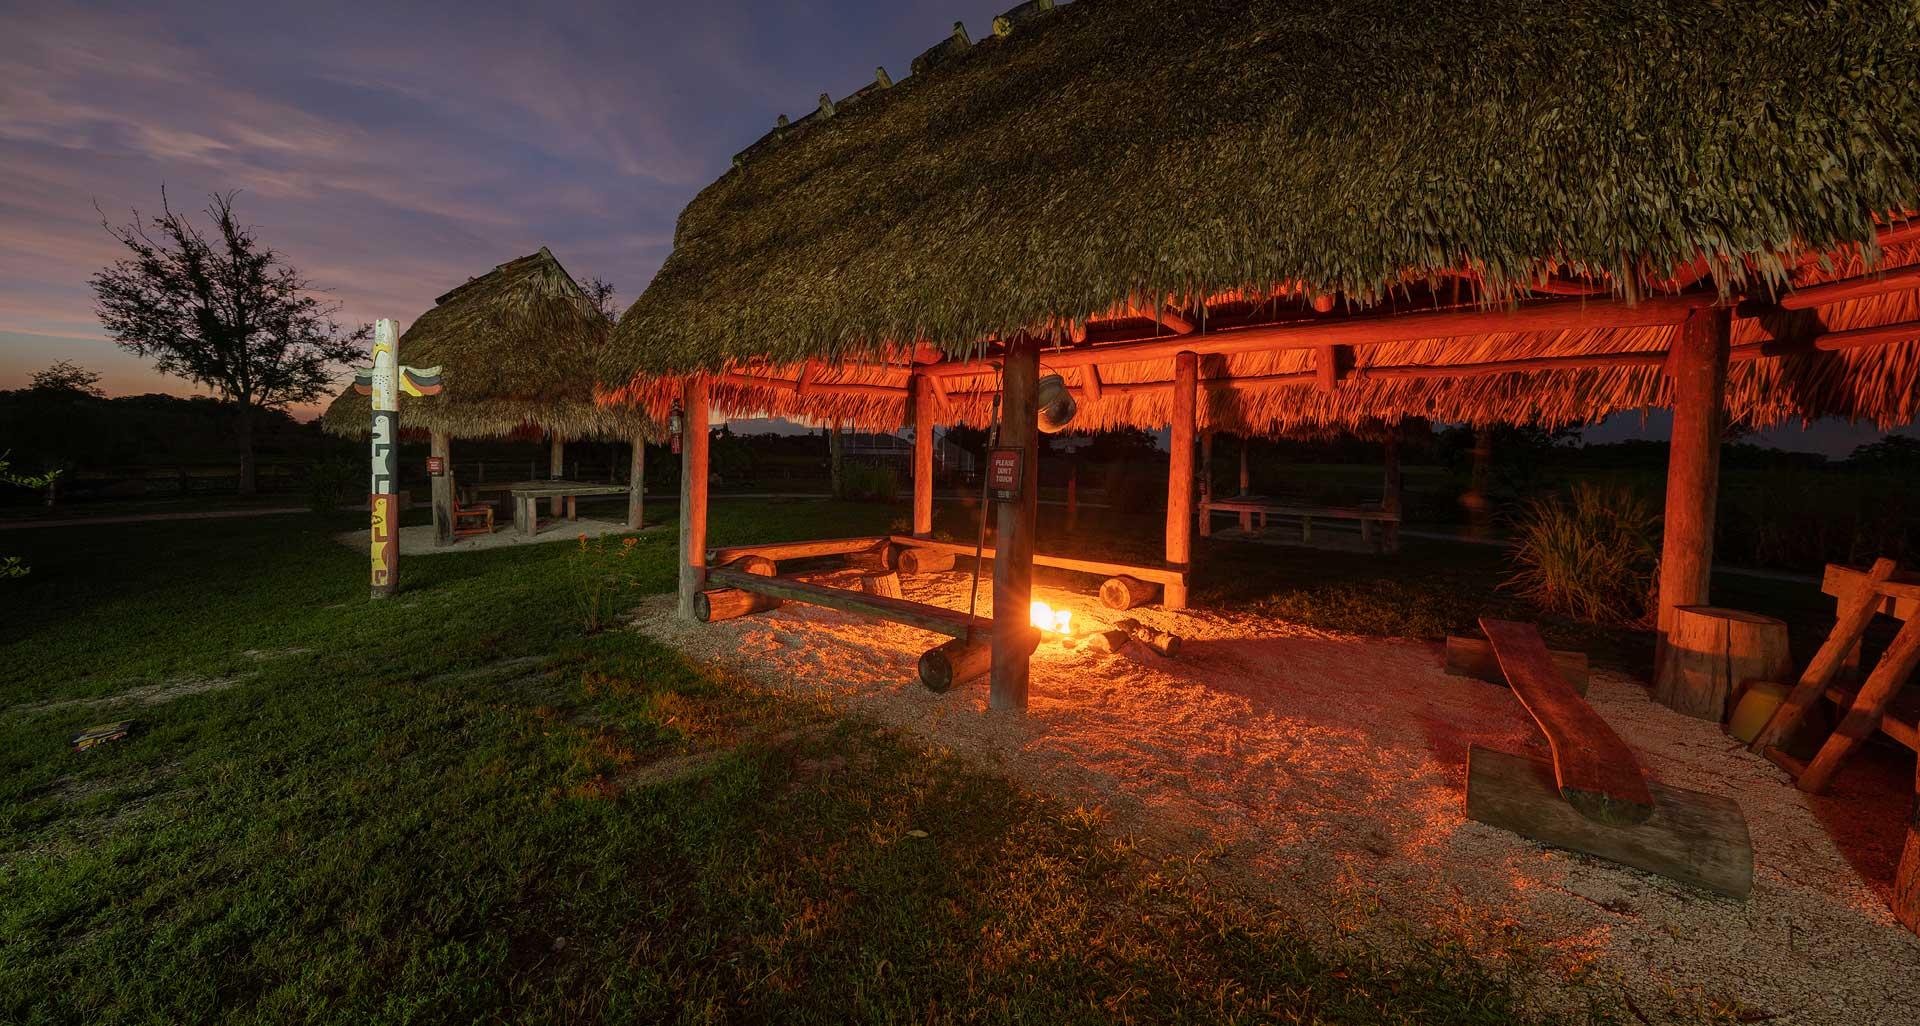 Florida Seminole Tourism - Camping